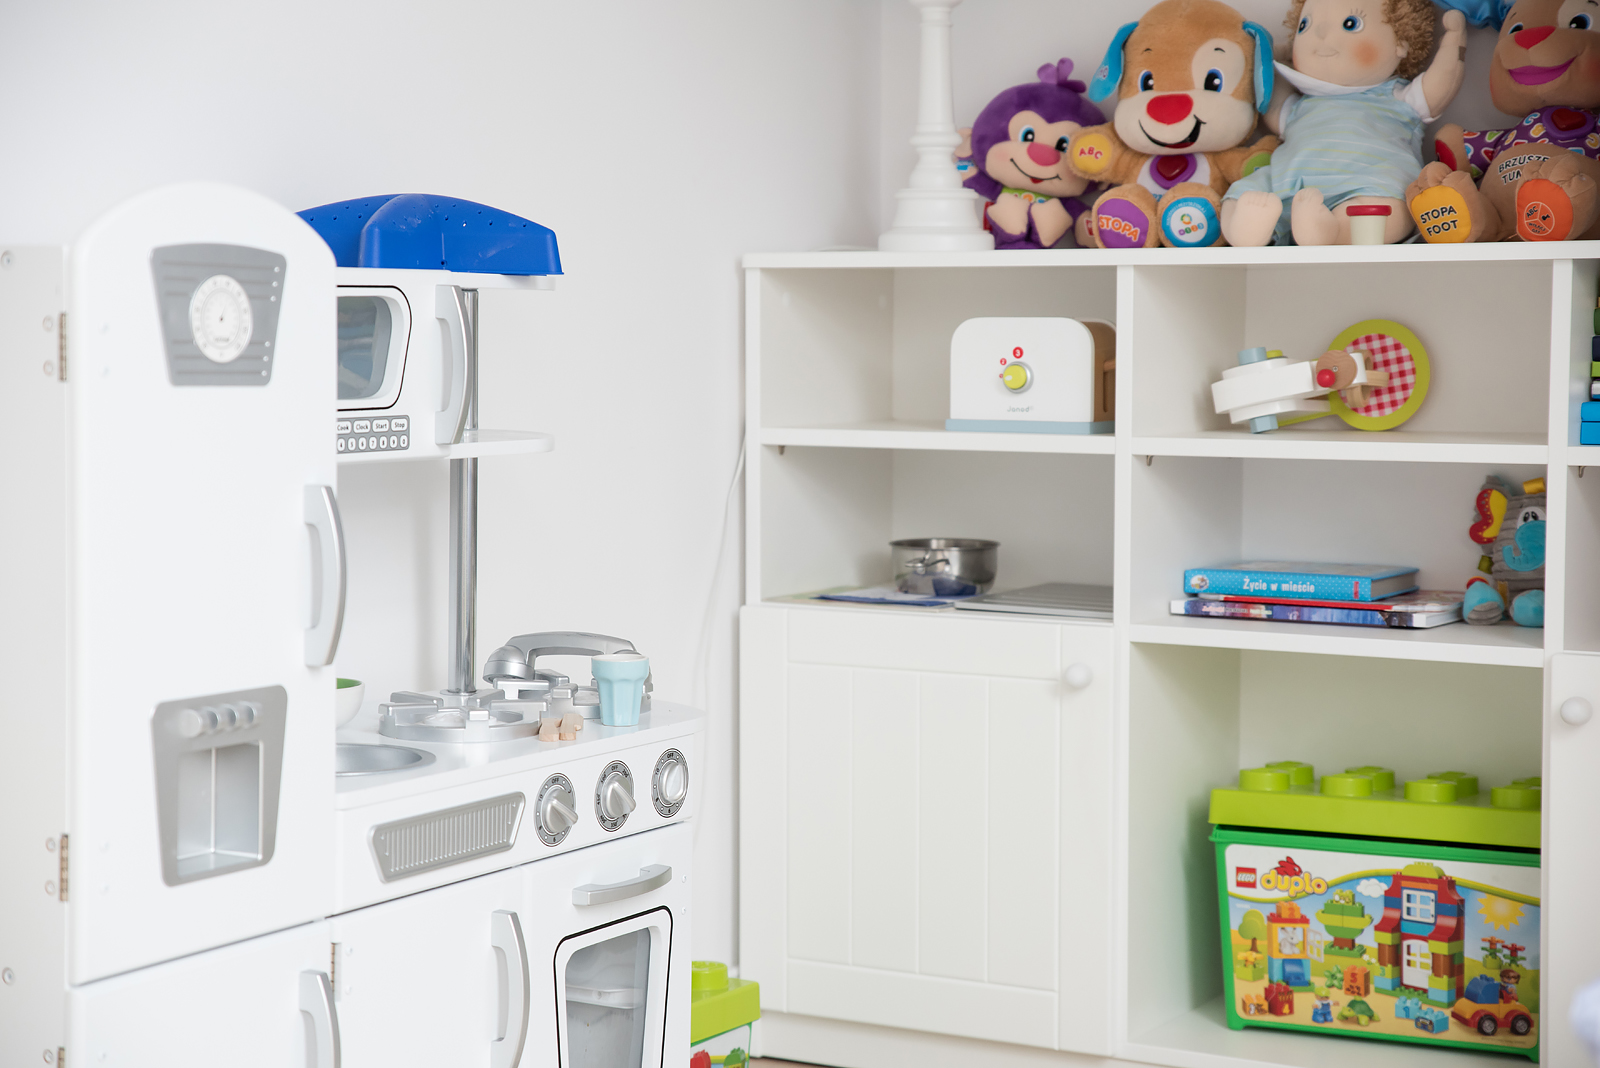 biala kuchenka dla dziecka